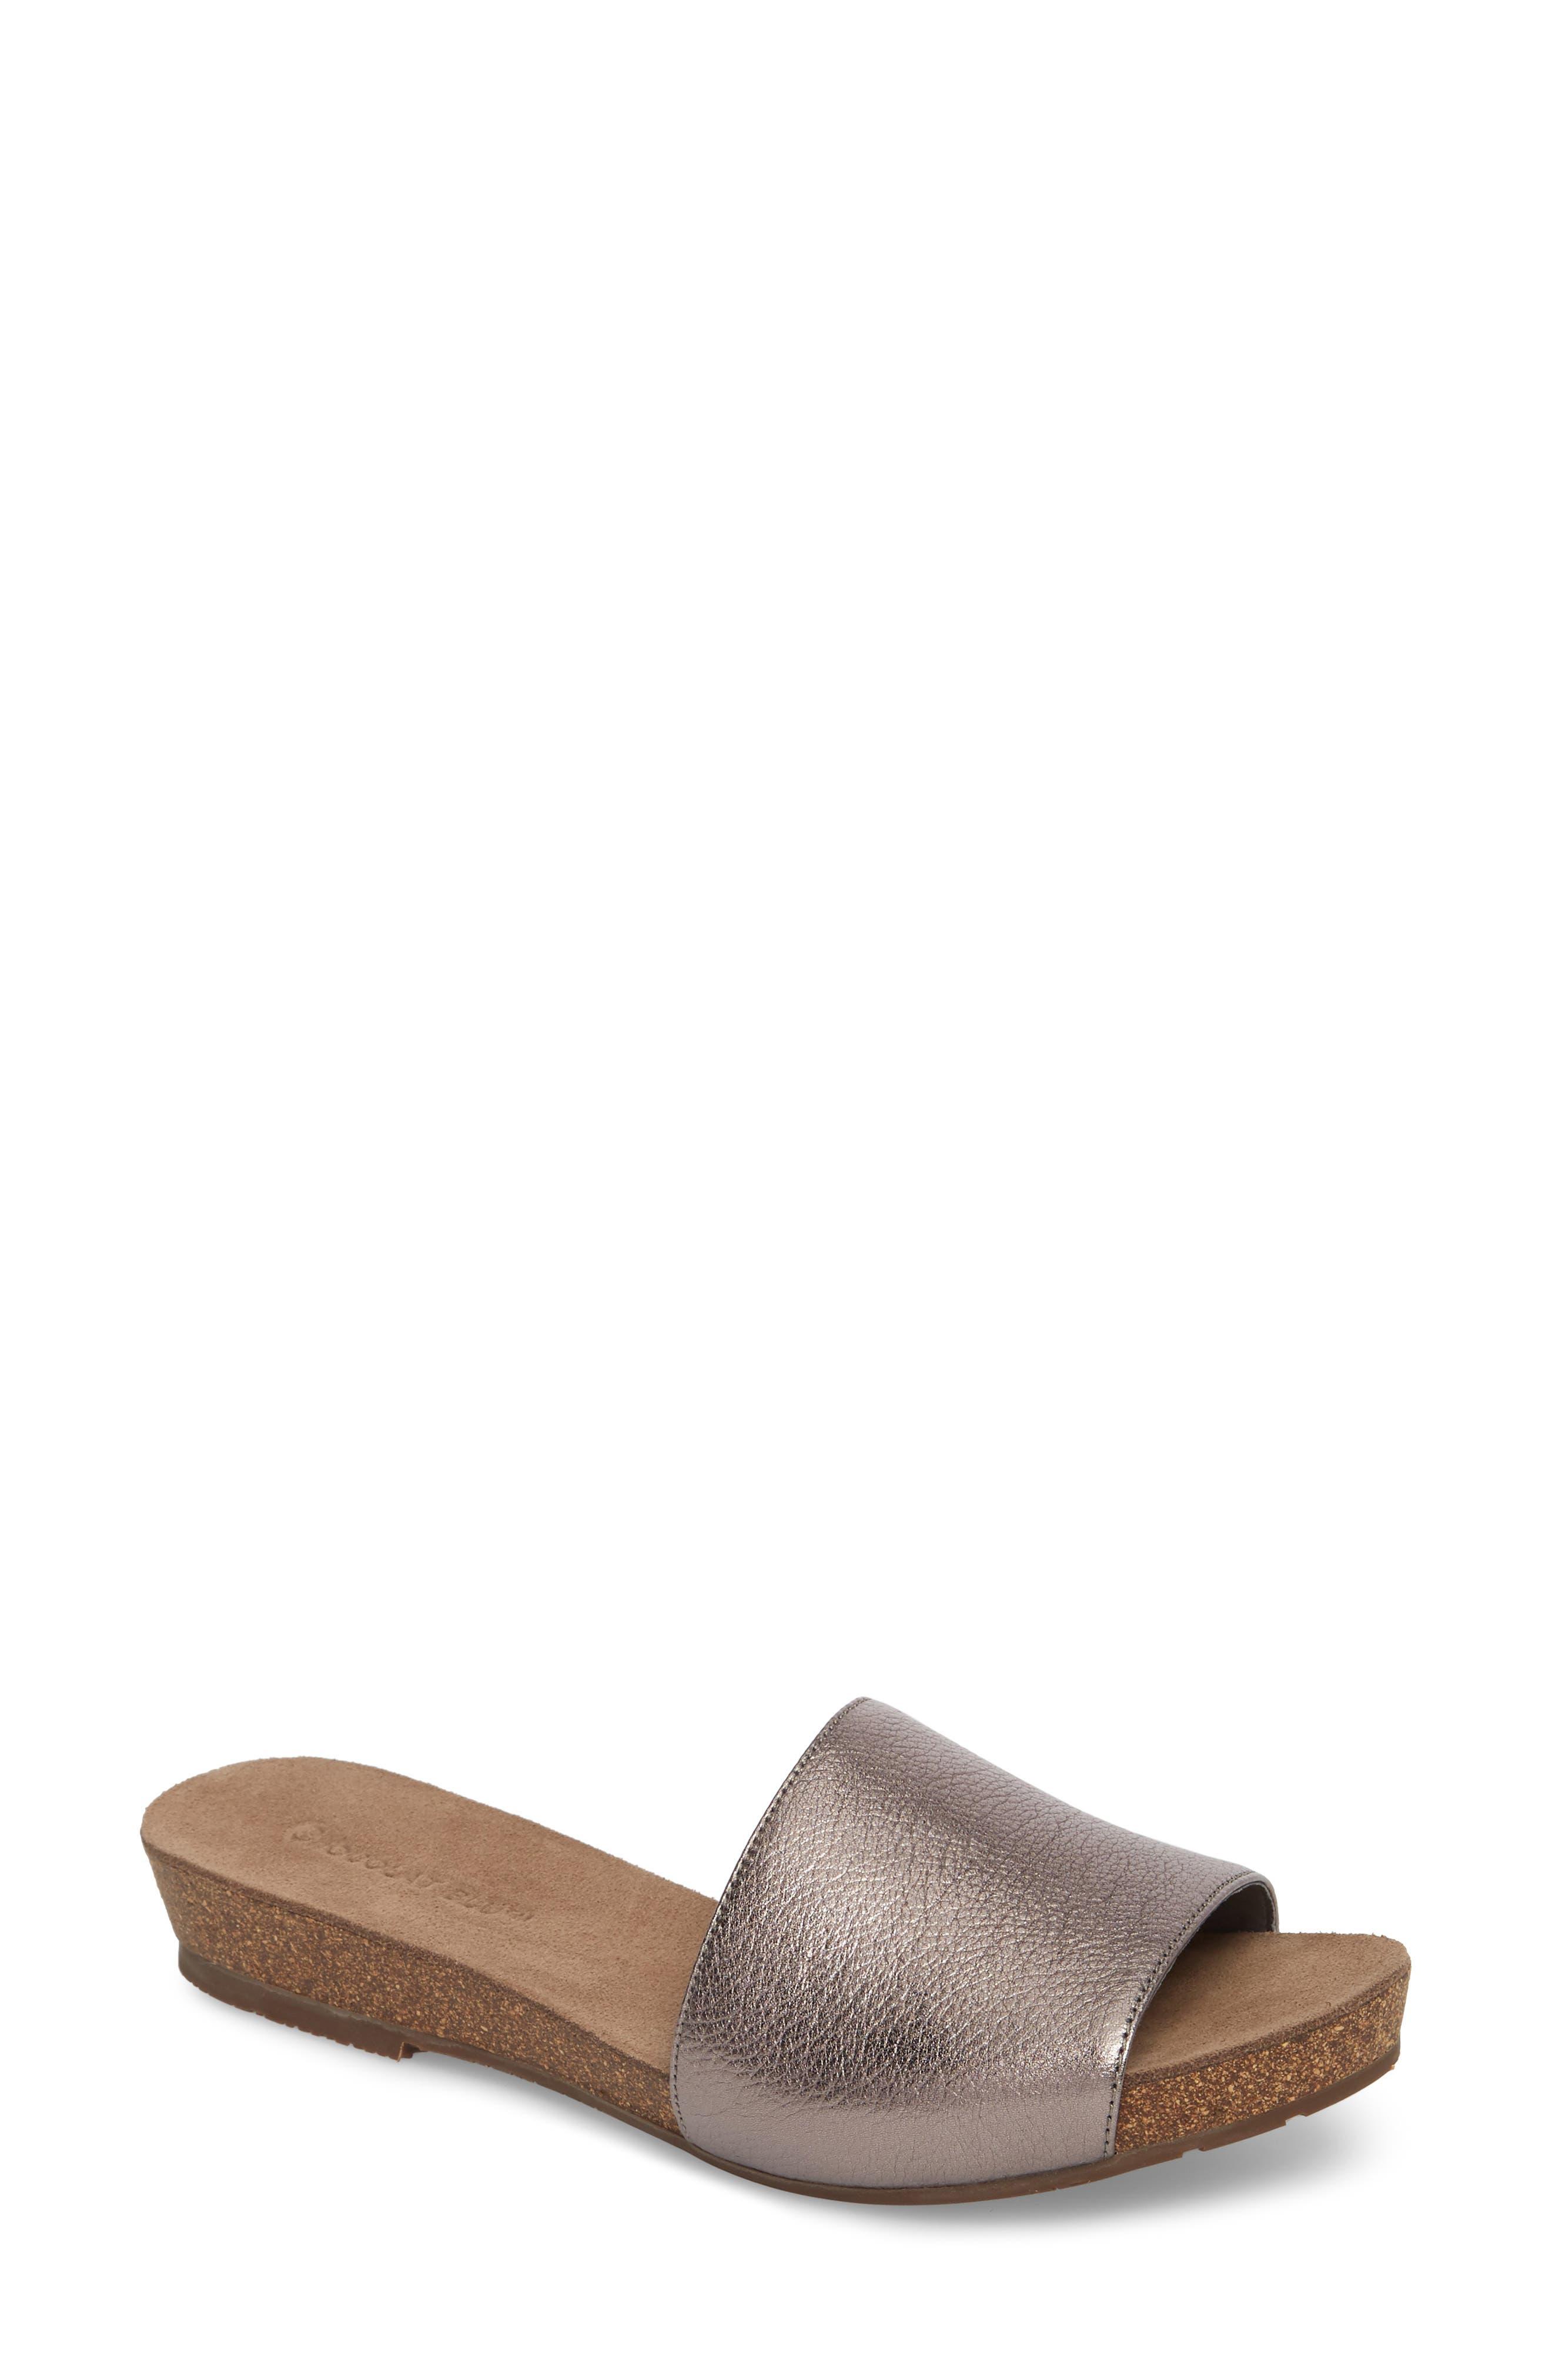 Alternate Image 1 Selected - Chocolat Blu Viveca Slide Sandal (Women)